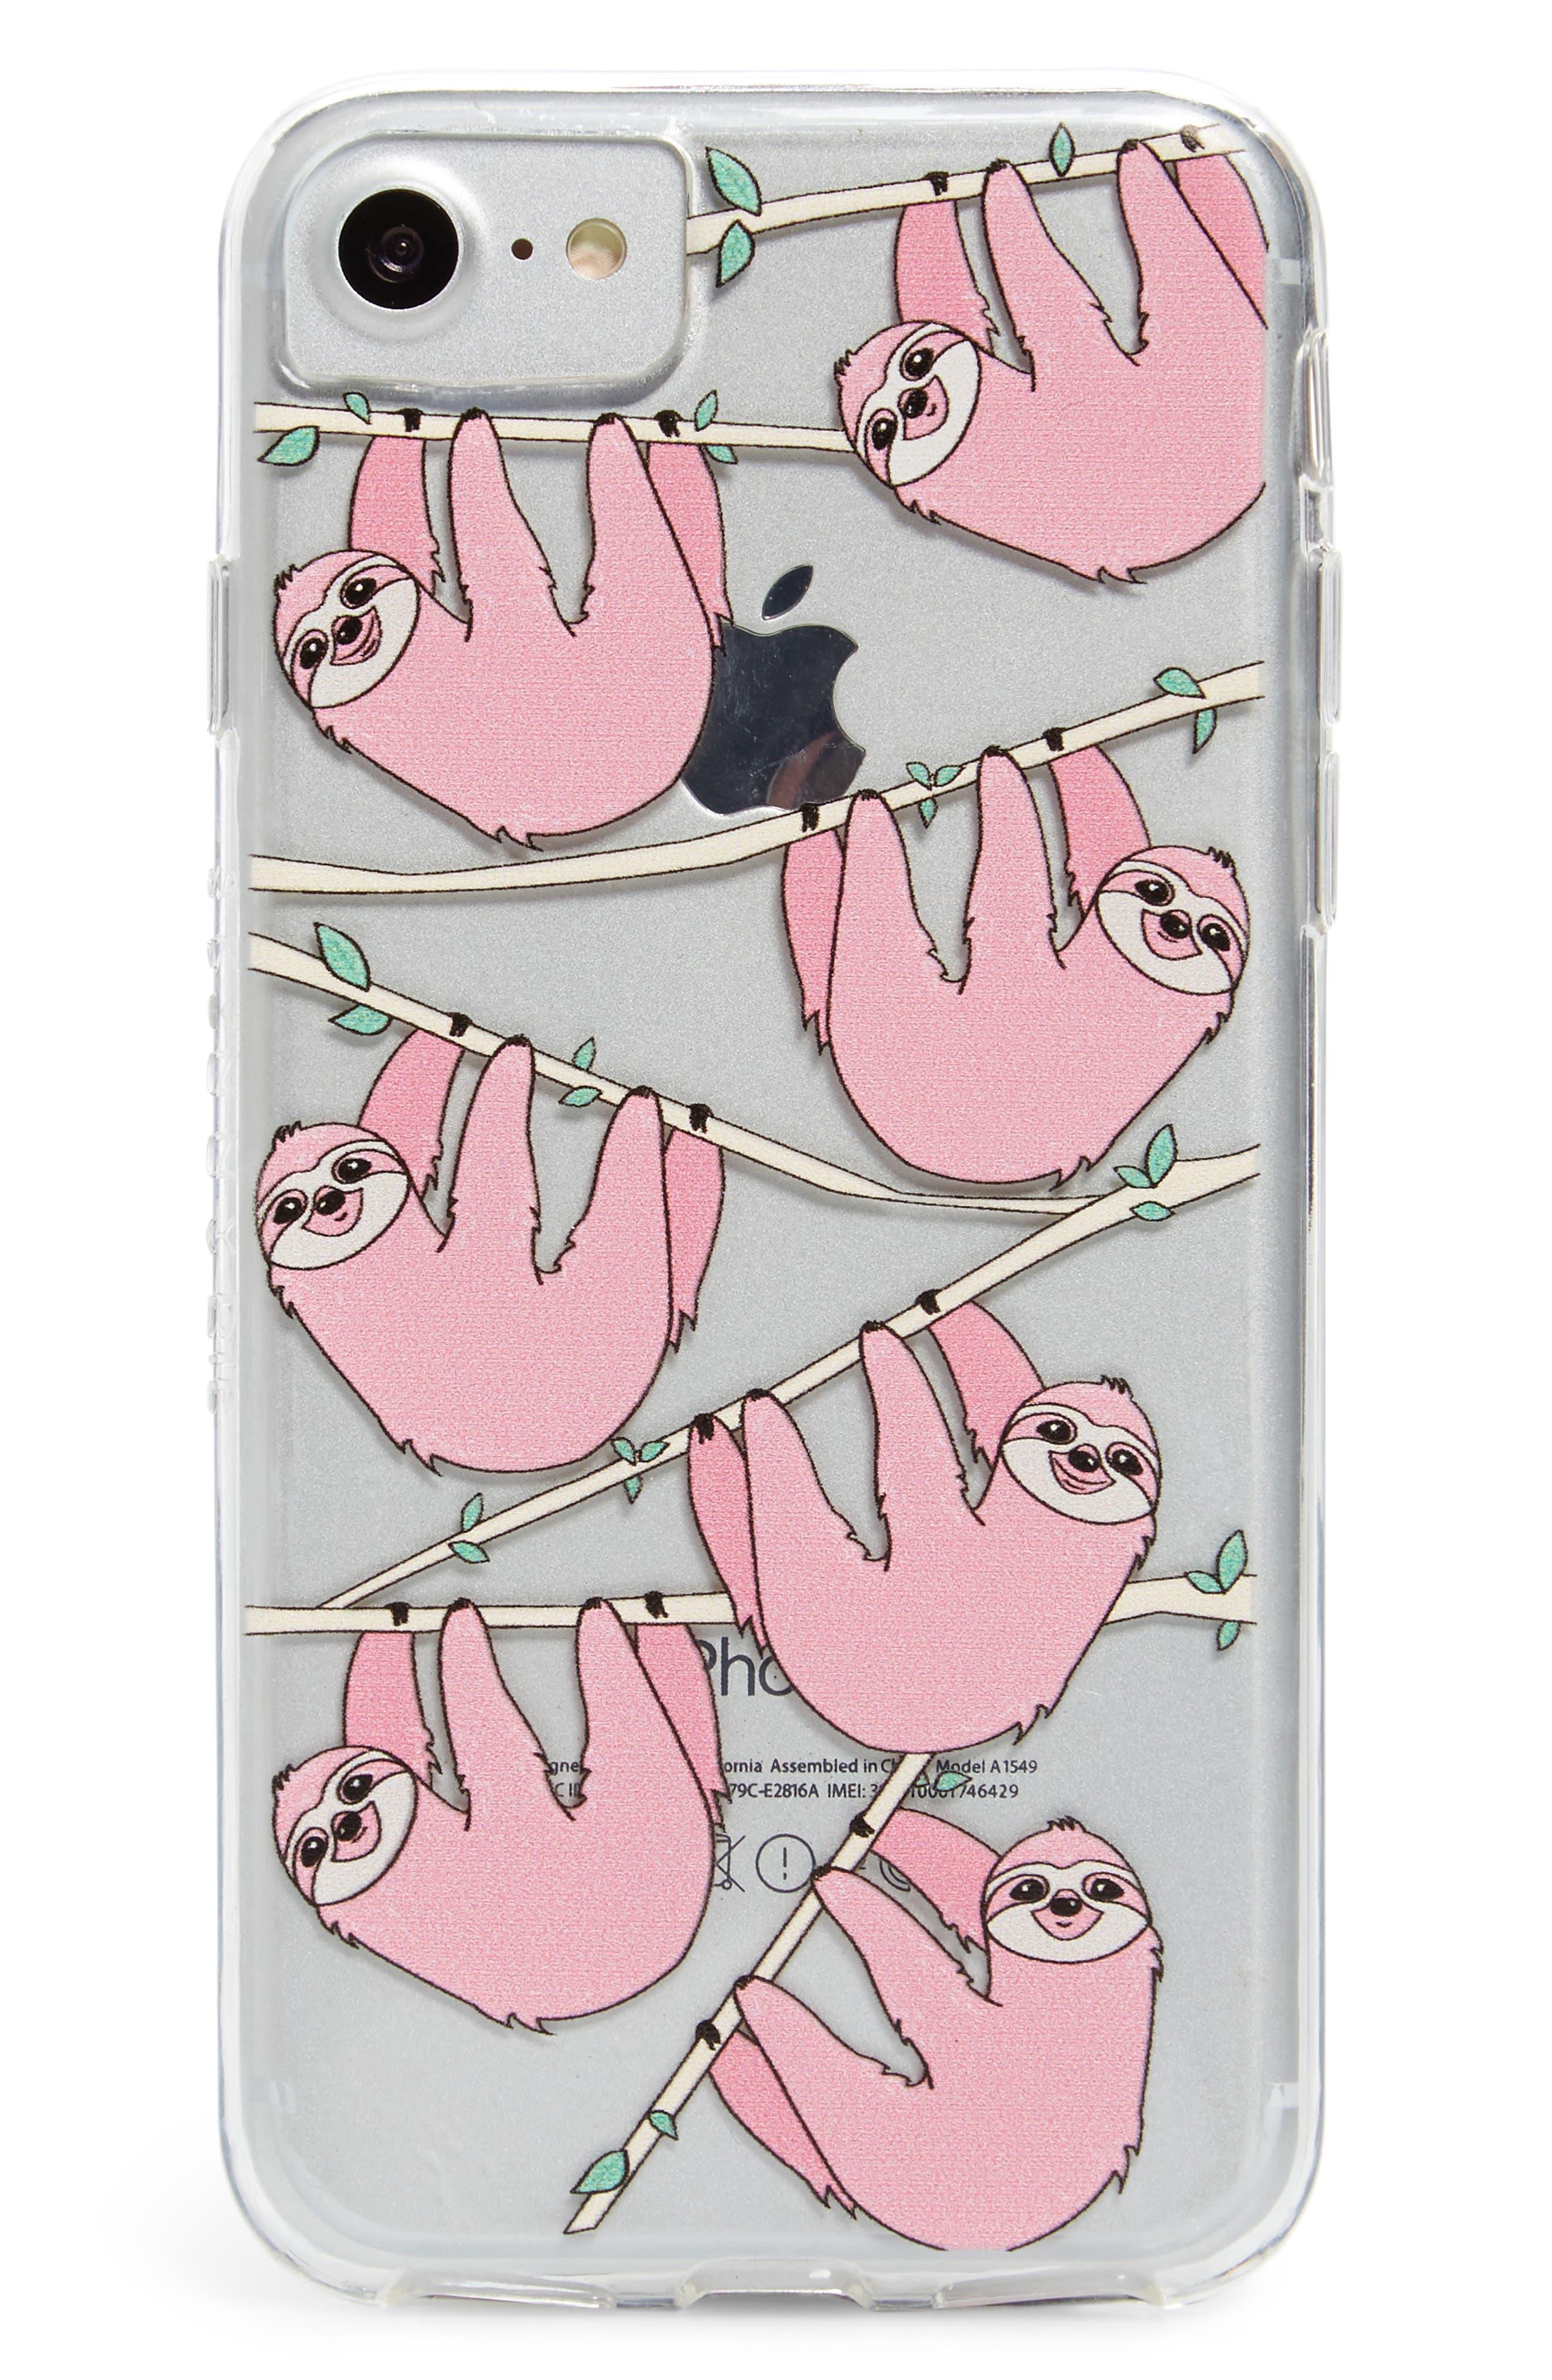 Skinny Dip Sloth iPhone 6/6s/7/8 & 6/6s/7/8 Plus Case,                             Main thumbnail 1, color,                             Pink